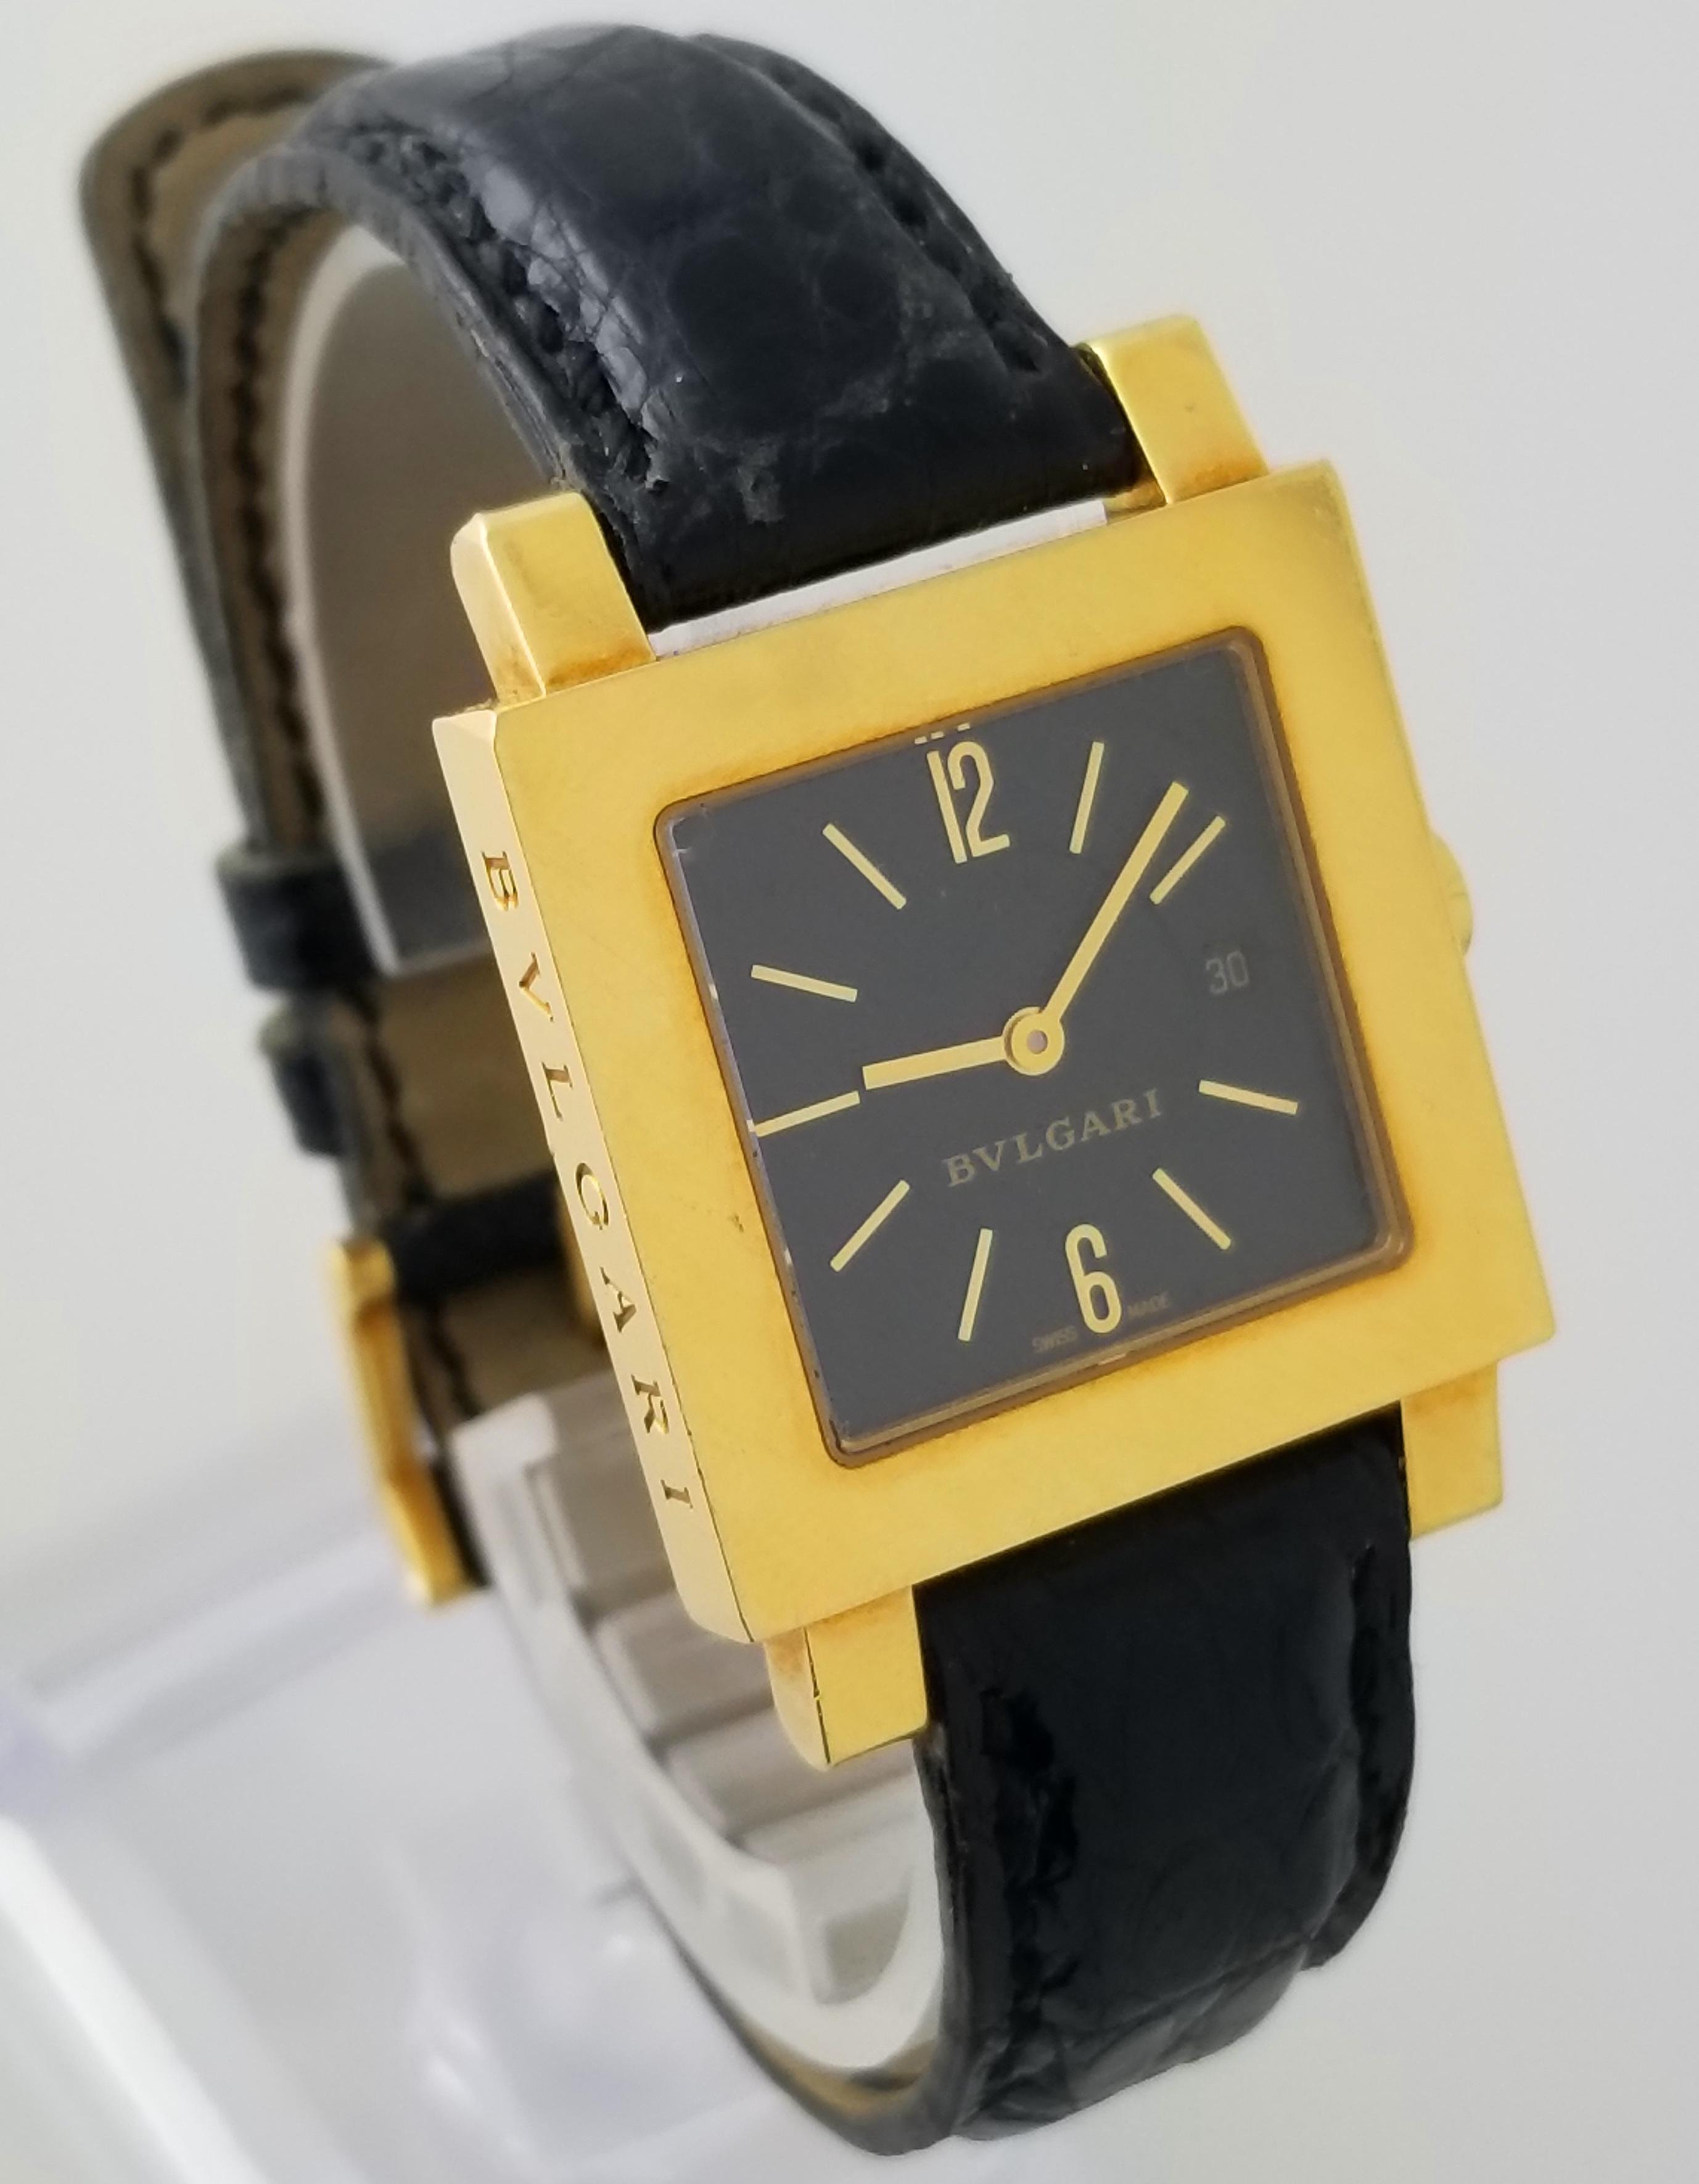 616e1dbf1d9 Details about Bulgari Quadrato SQ27GL 27mm 18k Yellow Gold Black Dial Date  Quartz Watch